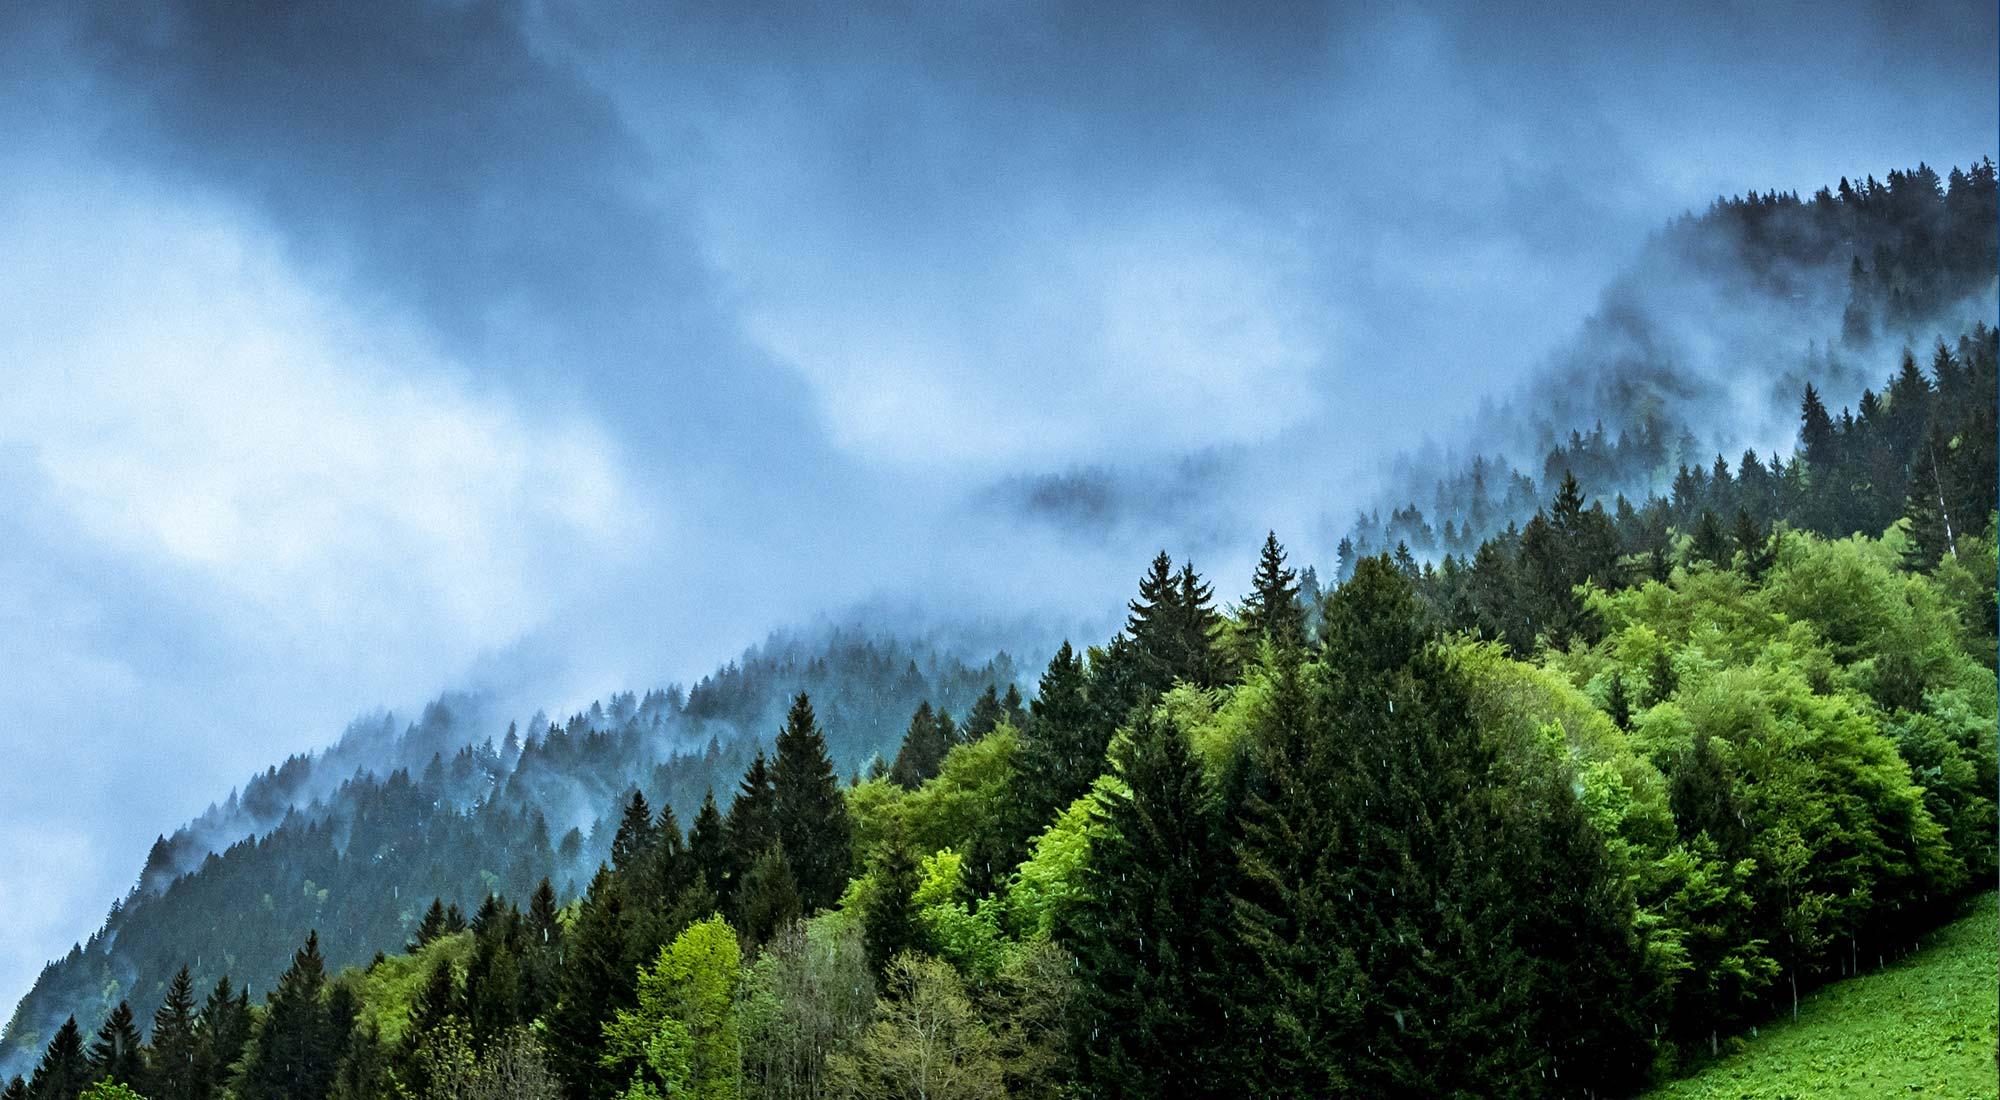 Ecologie verte & écologie bleue